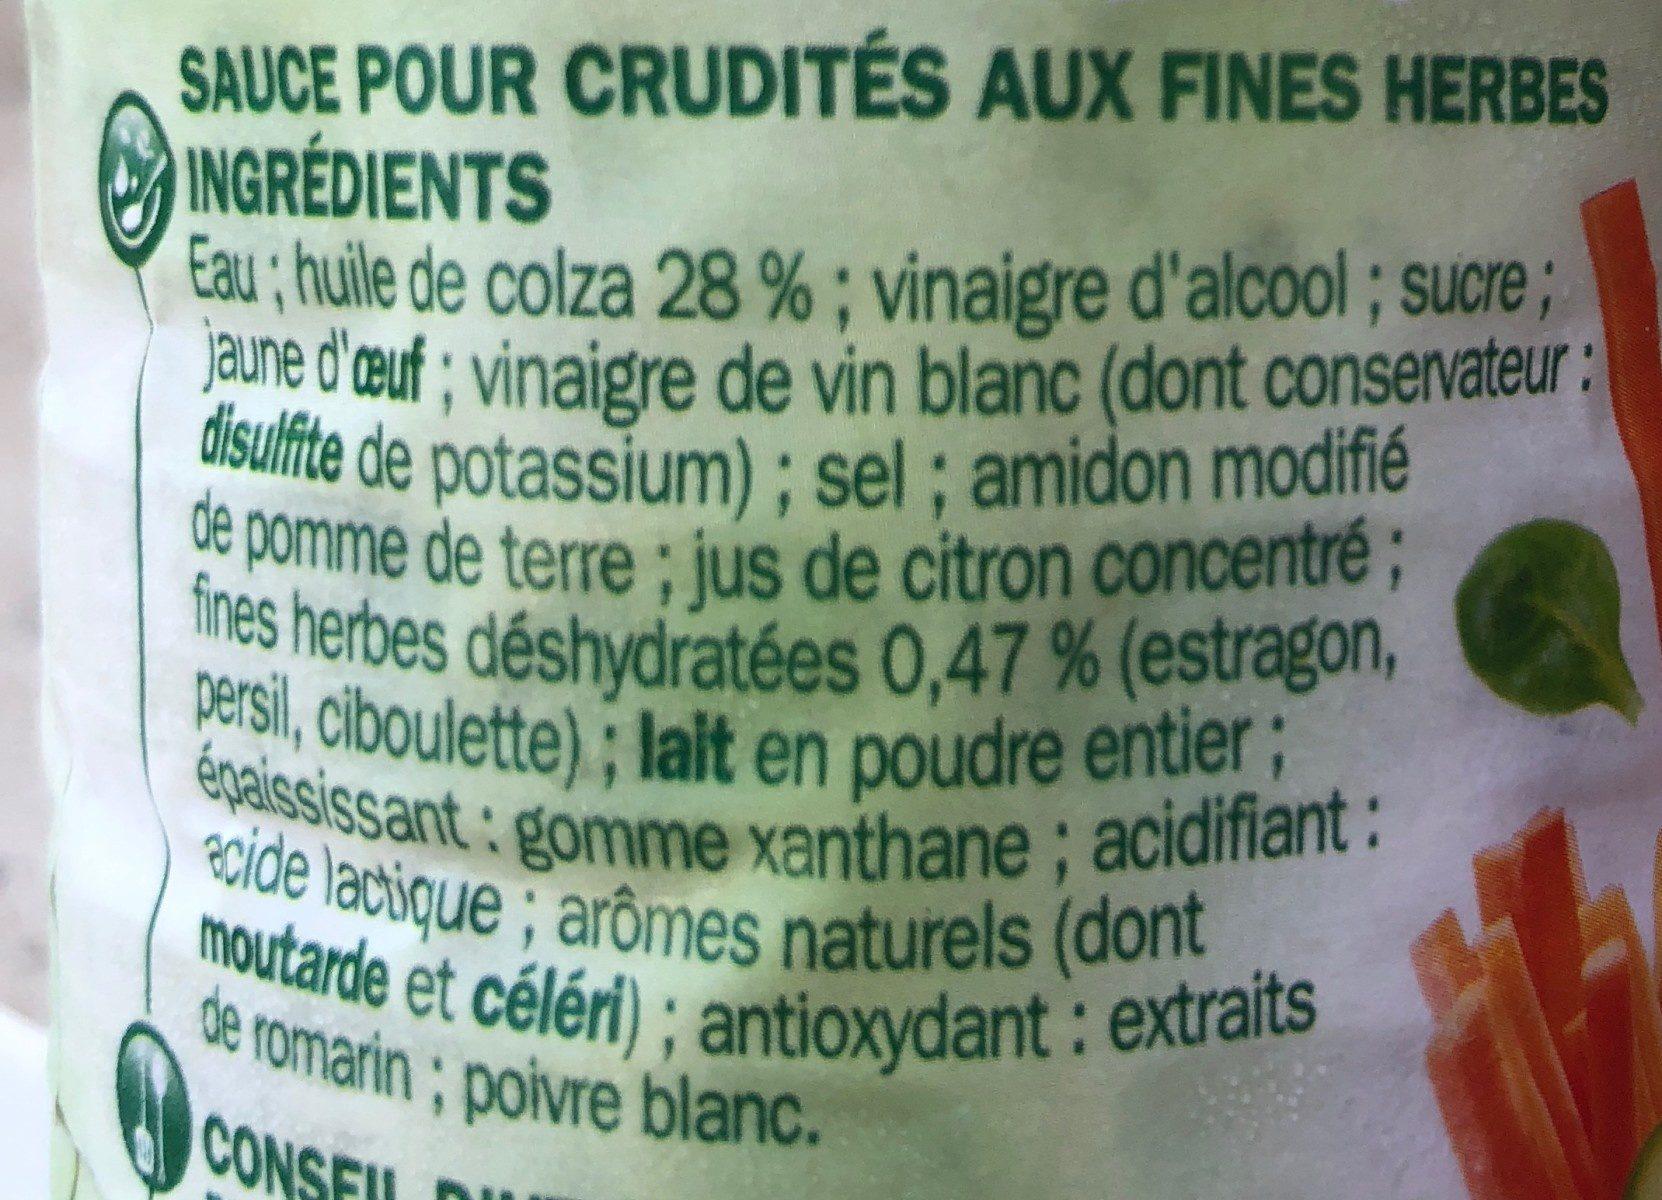 Sauce crudité fines herbes - Ingrediënten